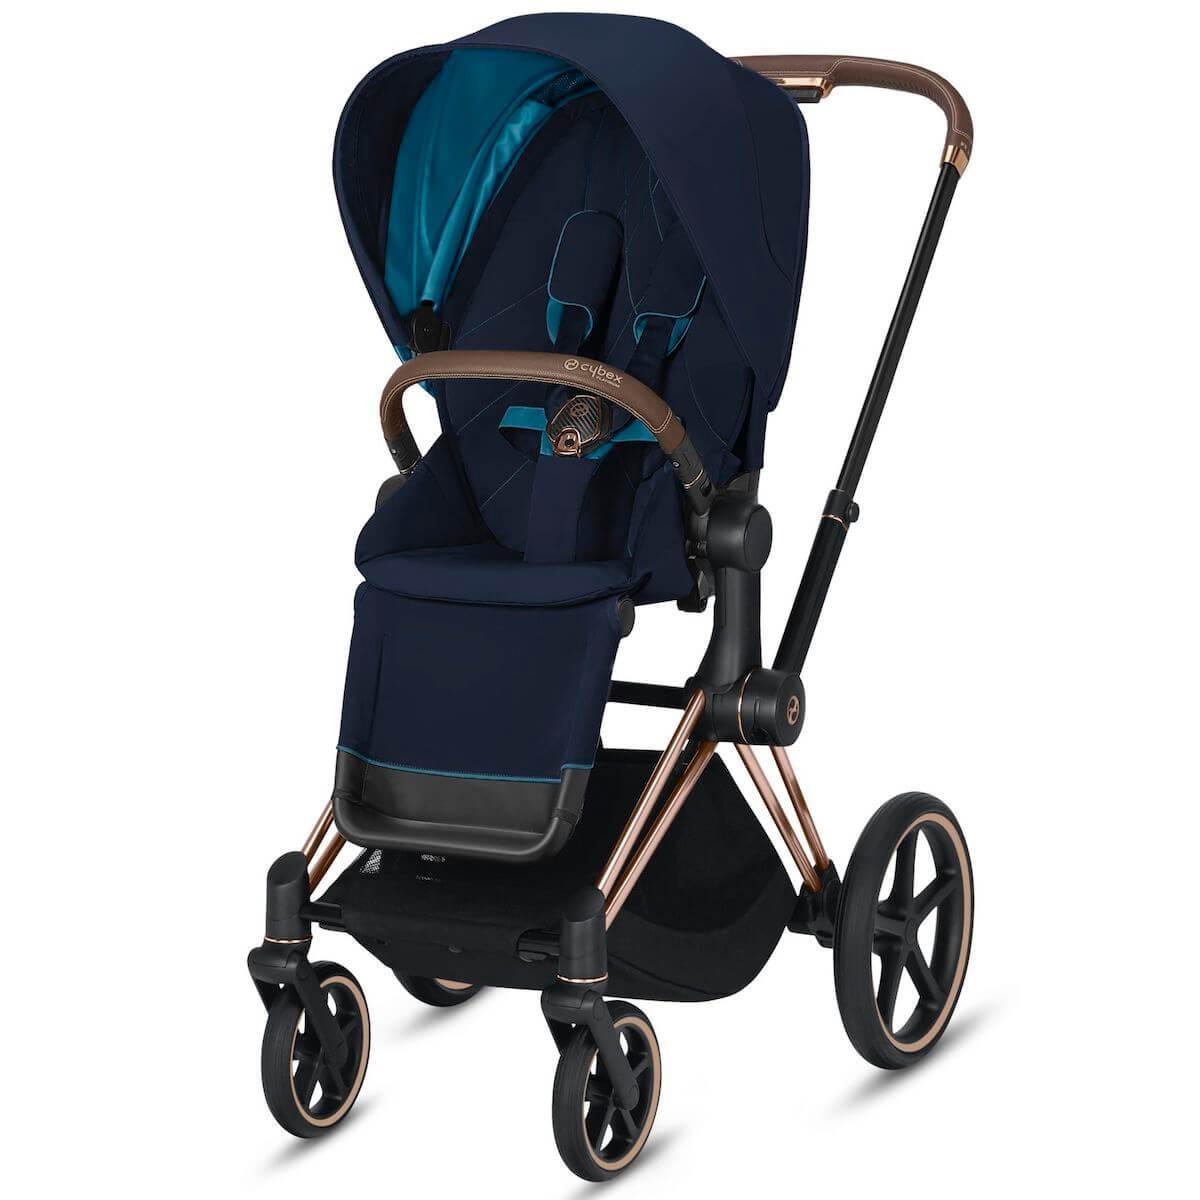 Asiento-pack silla PRIAM Cybex Nautical blue